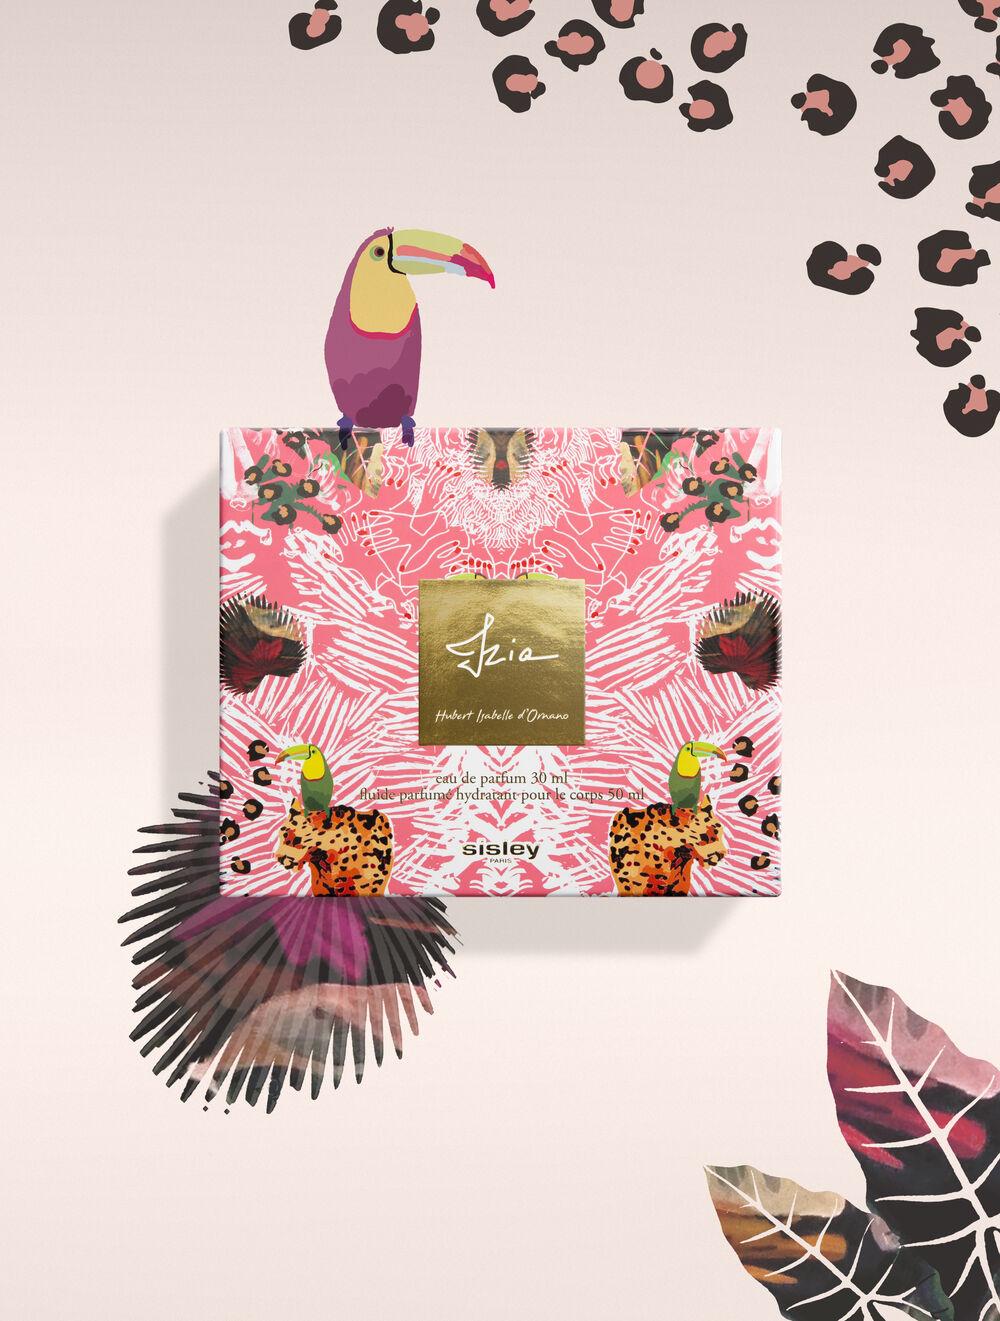 Izia 30ml Gift Set